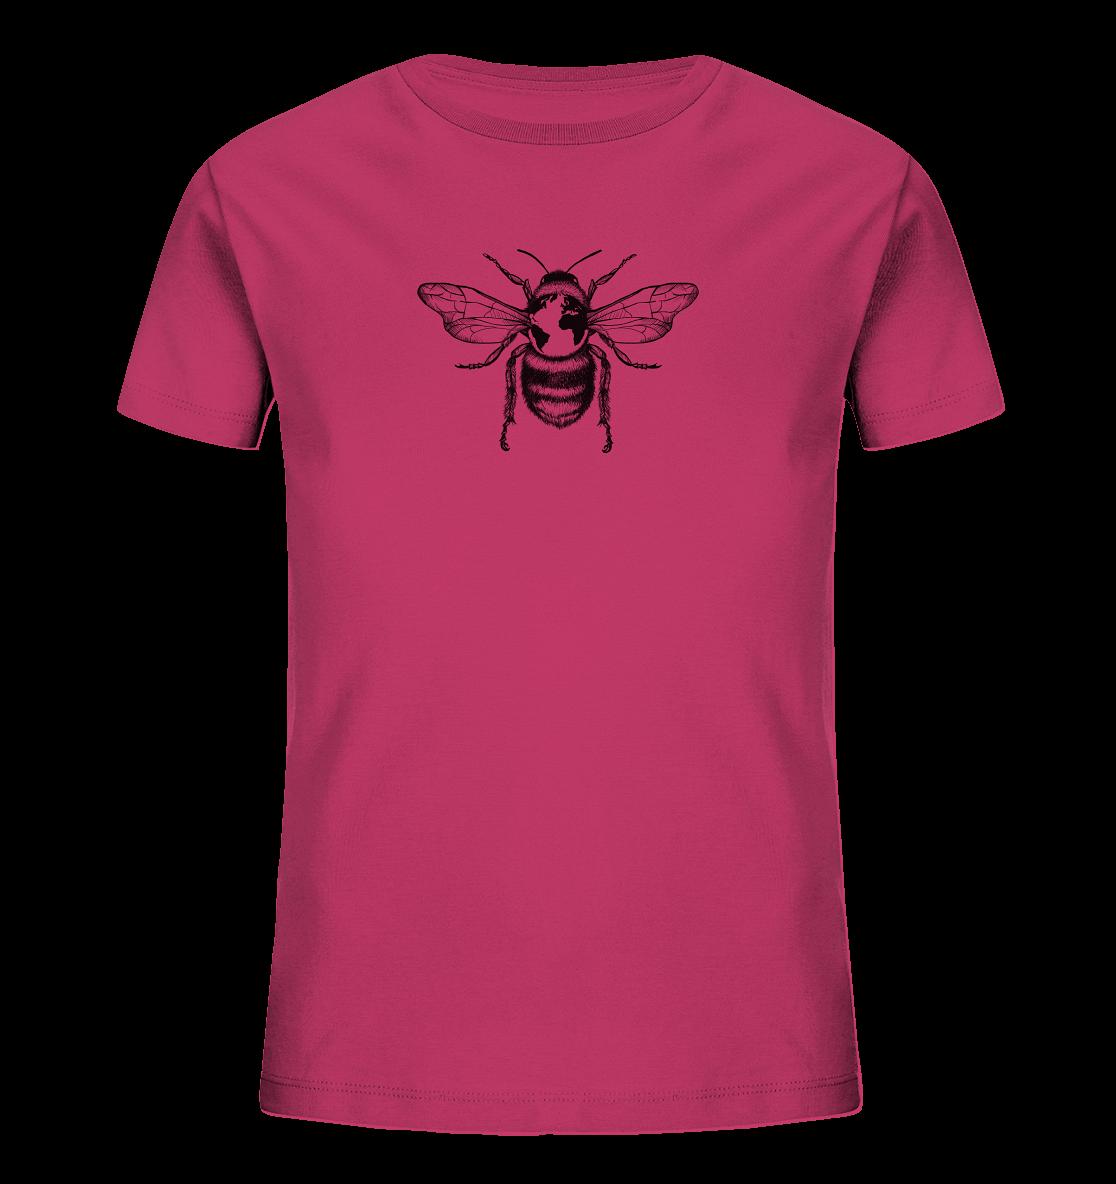 front-kids-organic-shirt-c63a6a-1116x-2.png